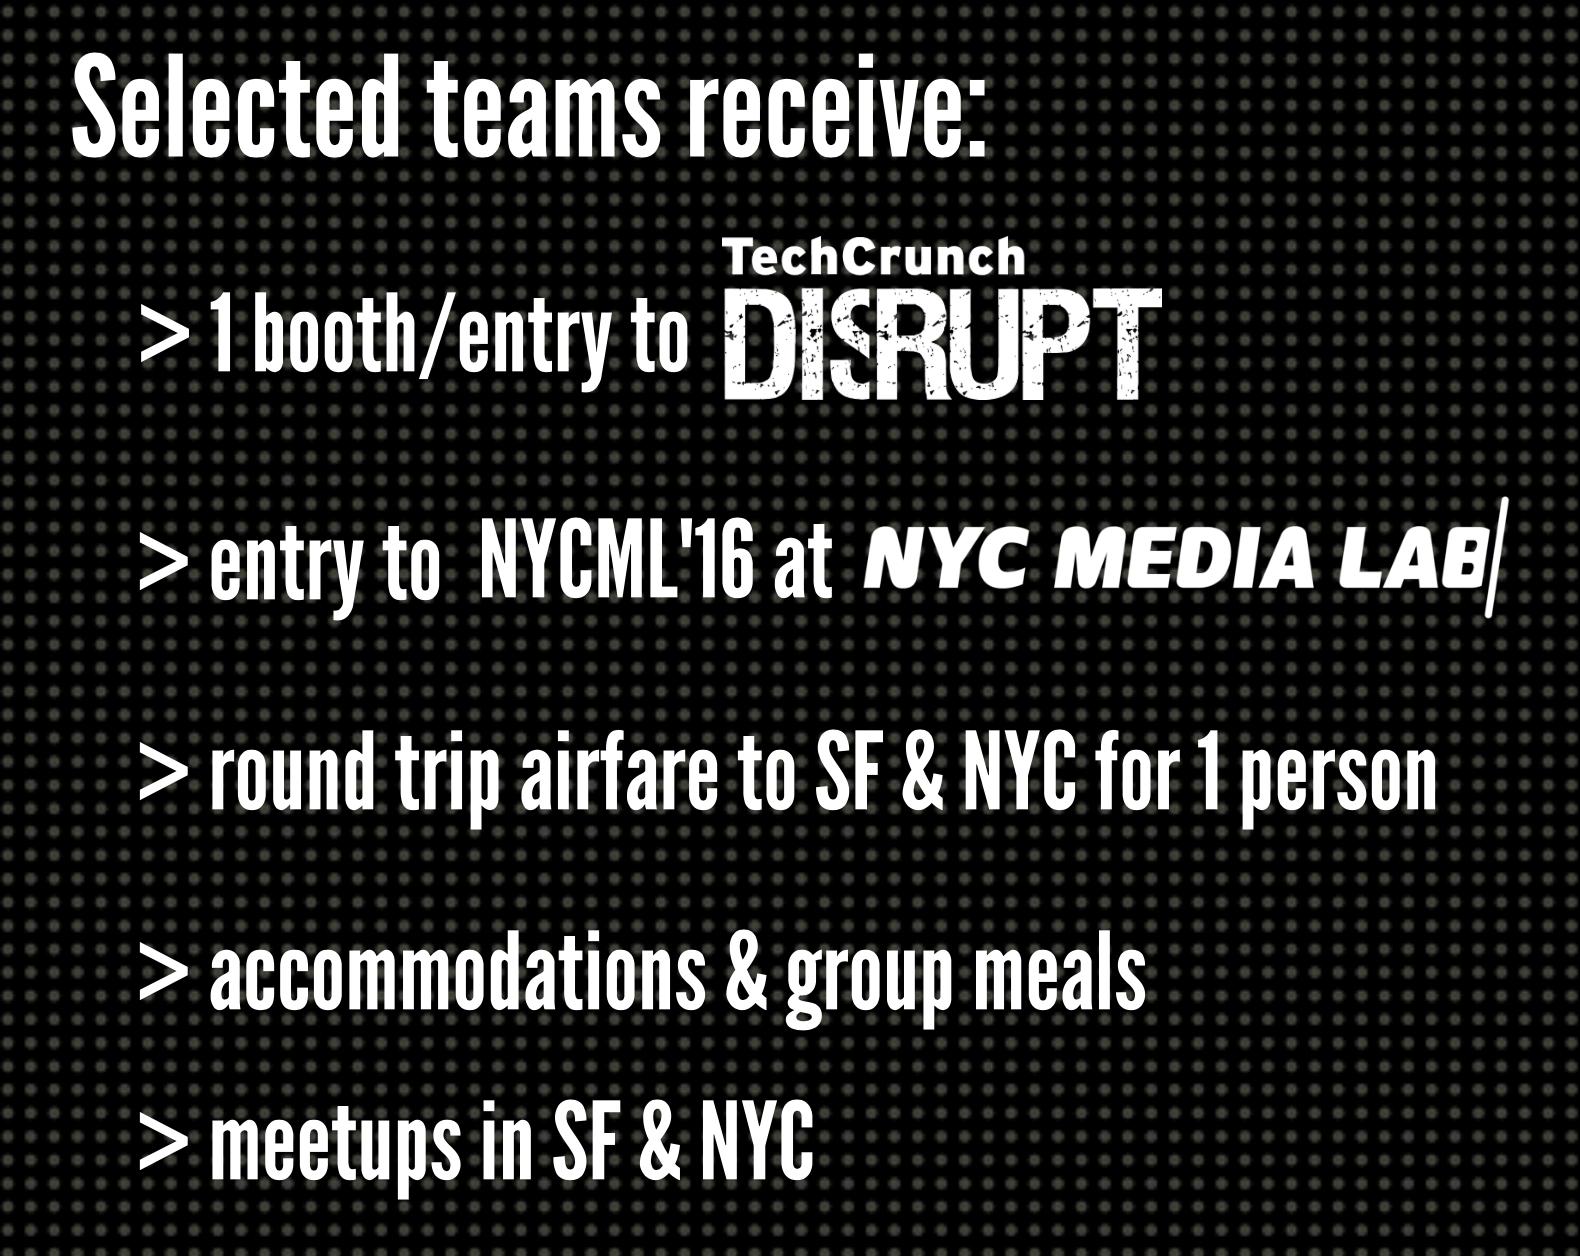 taiwan-startup-stadium-techcrunch-disrupt-nyc-media-lab-nycml16.jpg